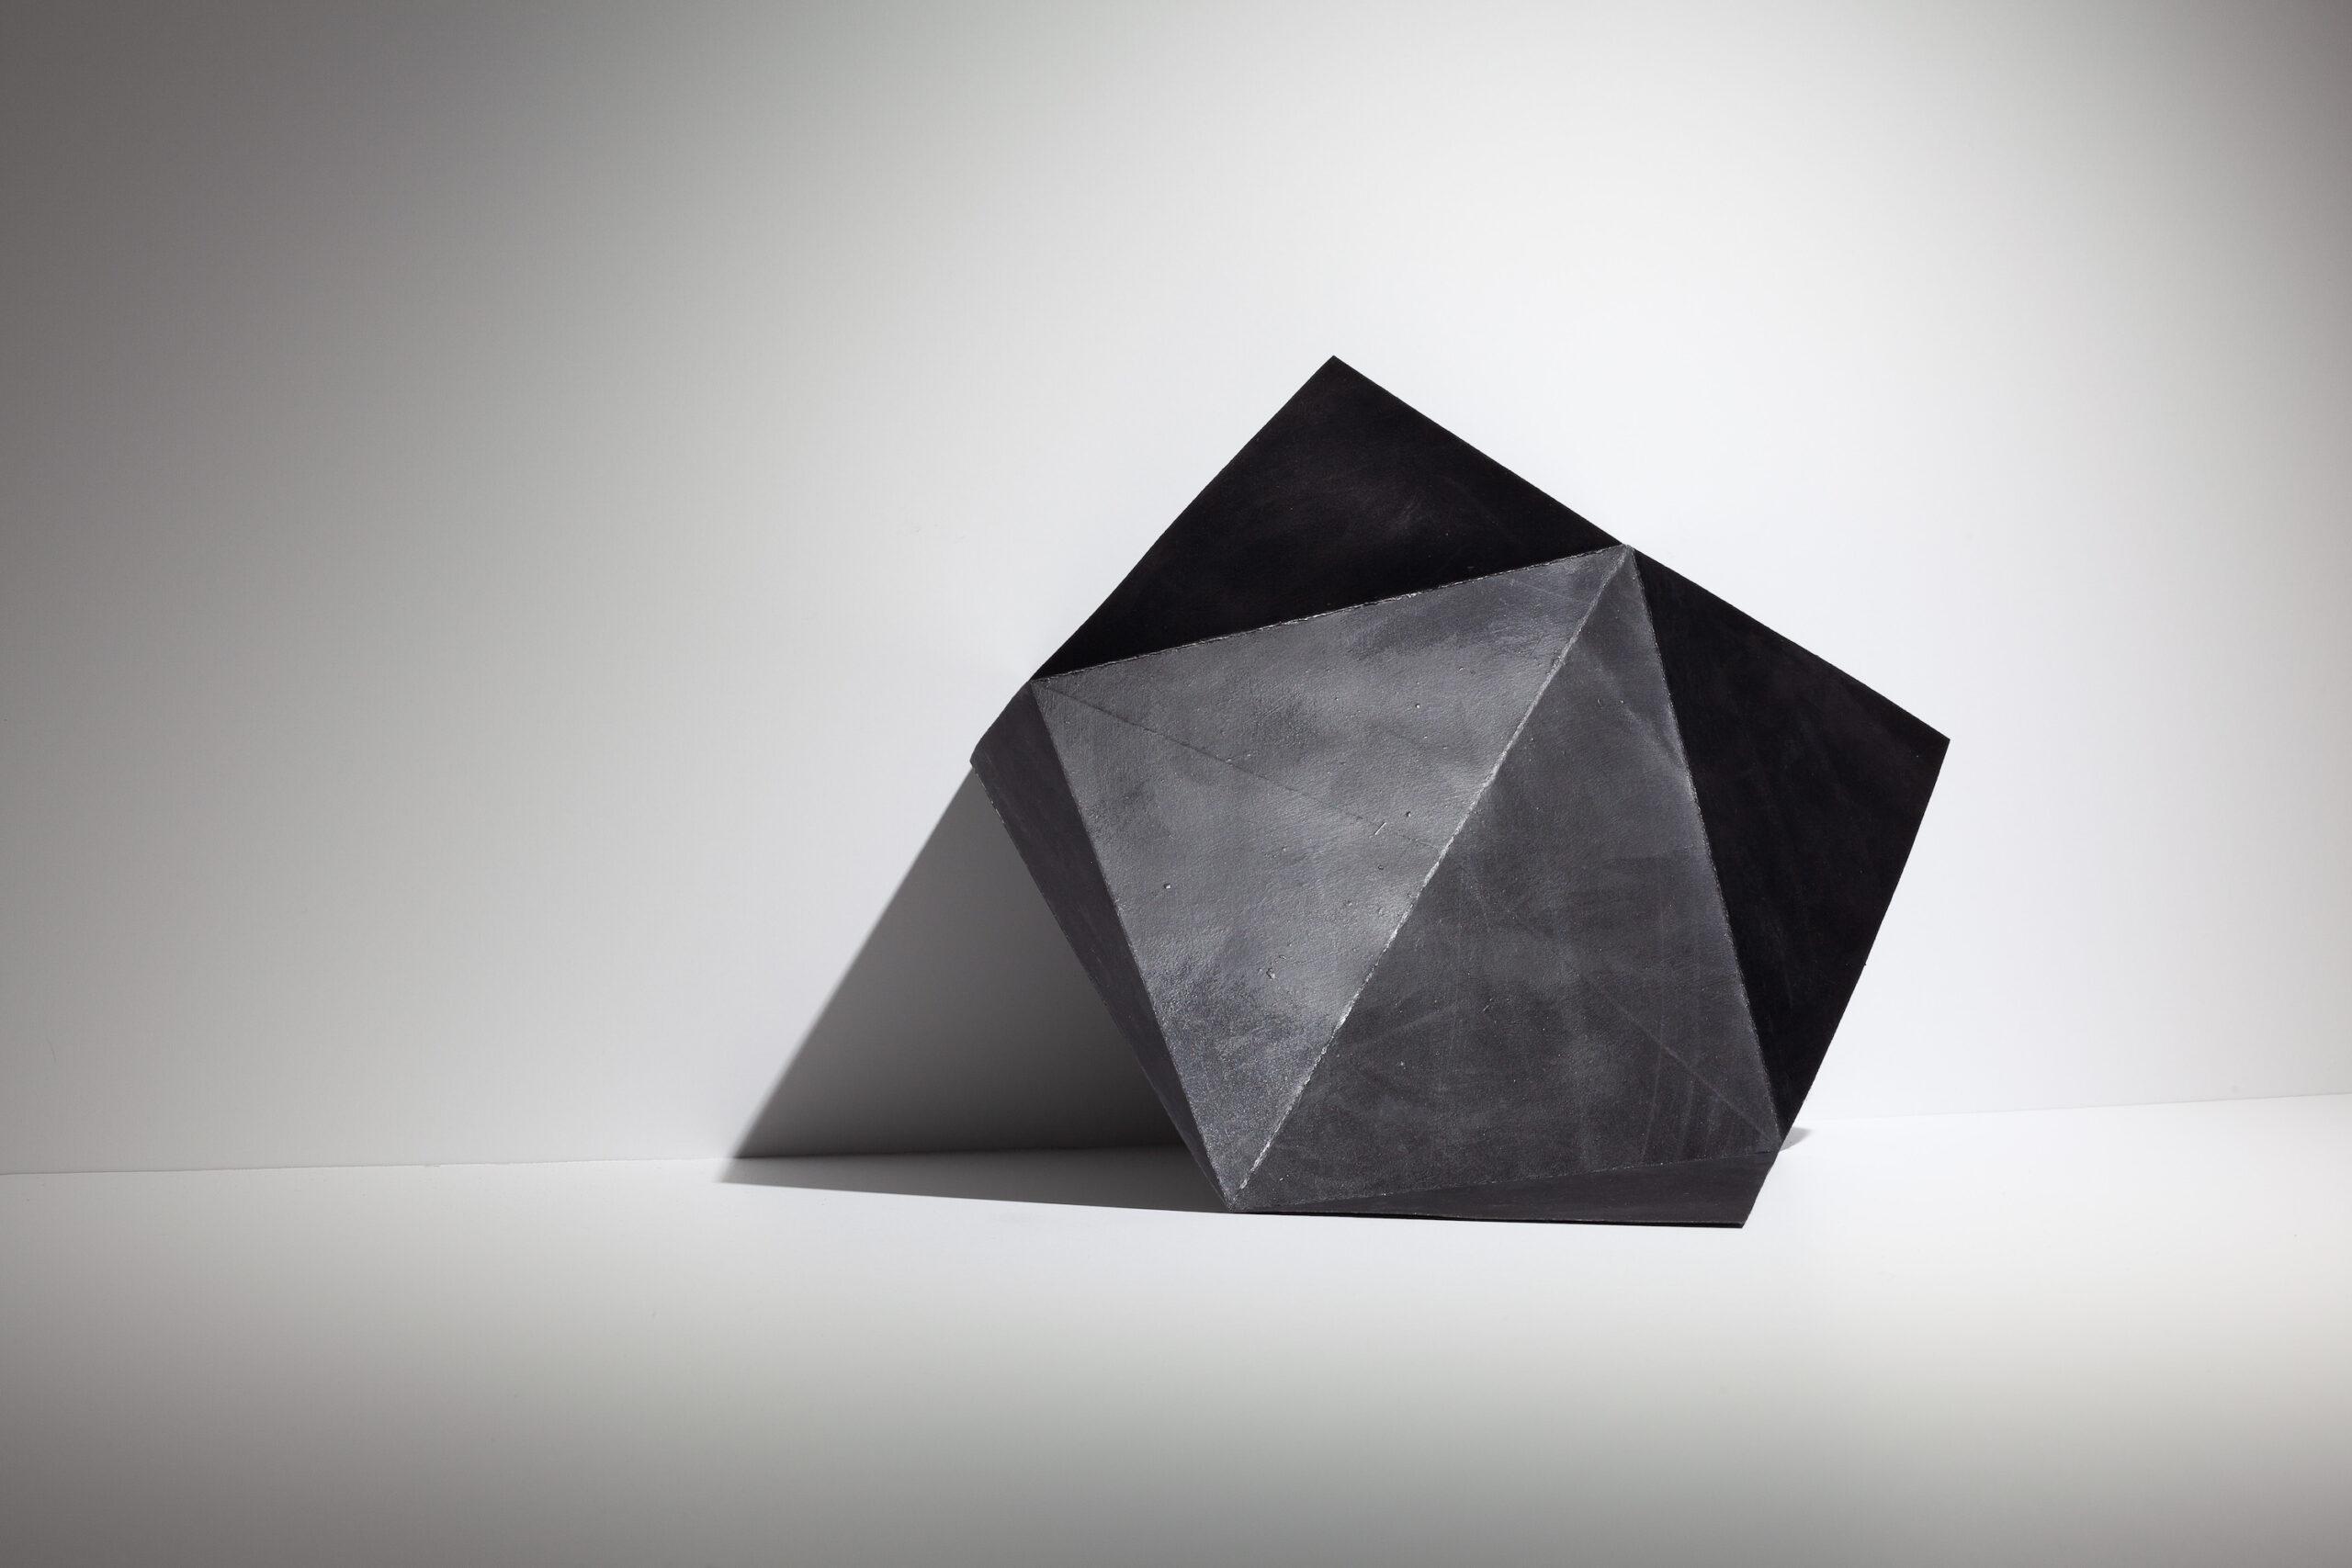 Felecia Chizuko Carlisle, Unfolded with Triangular Shadow, 2020